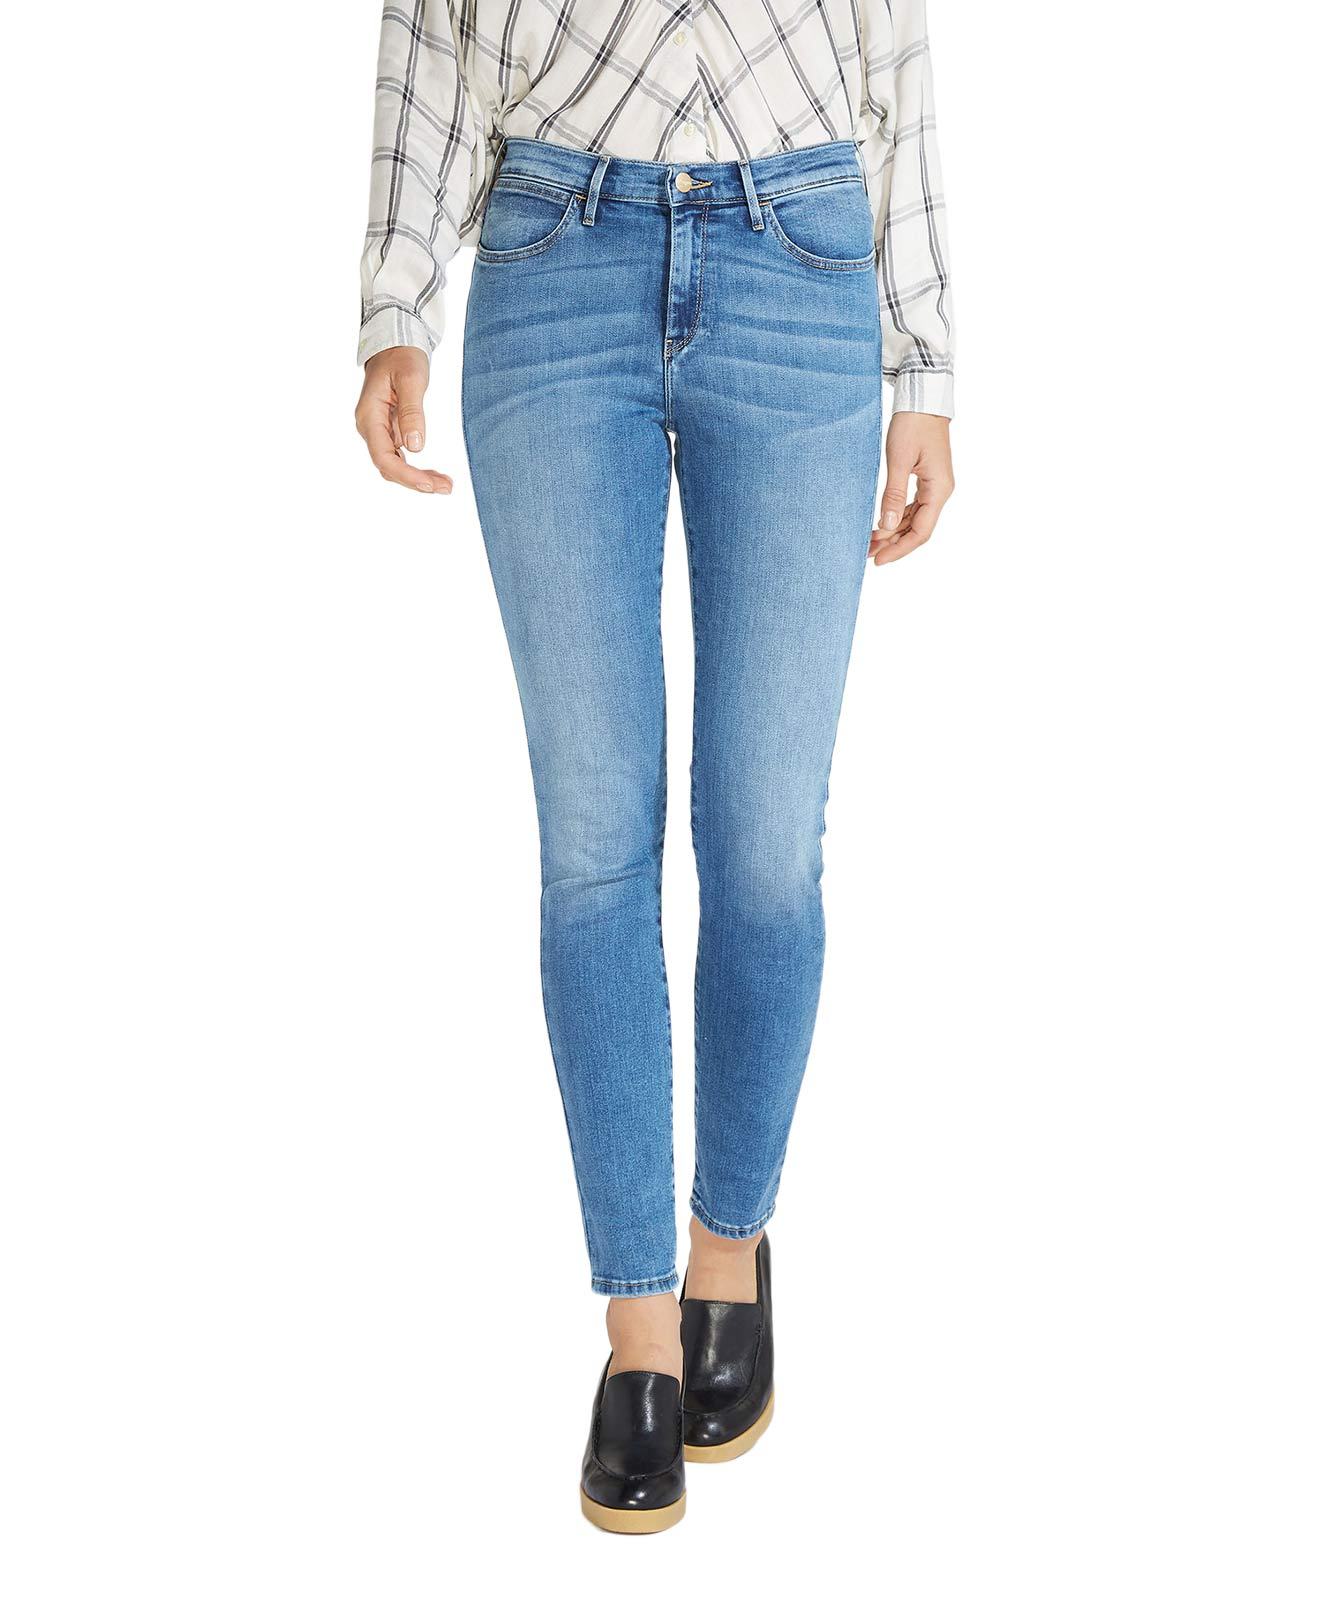 Hosen für Frauen - WRANGLER HIGH RISE SKINNY Jeans Best Blue  - Onlineshop Jeans Meile